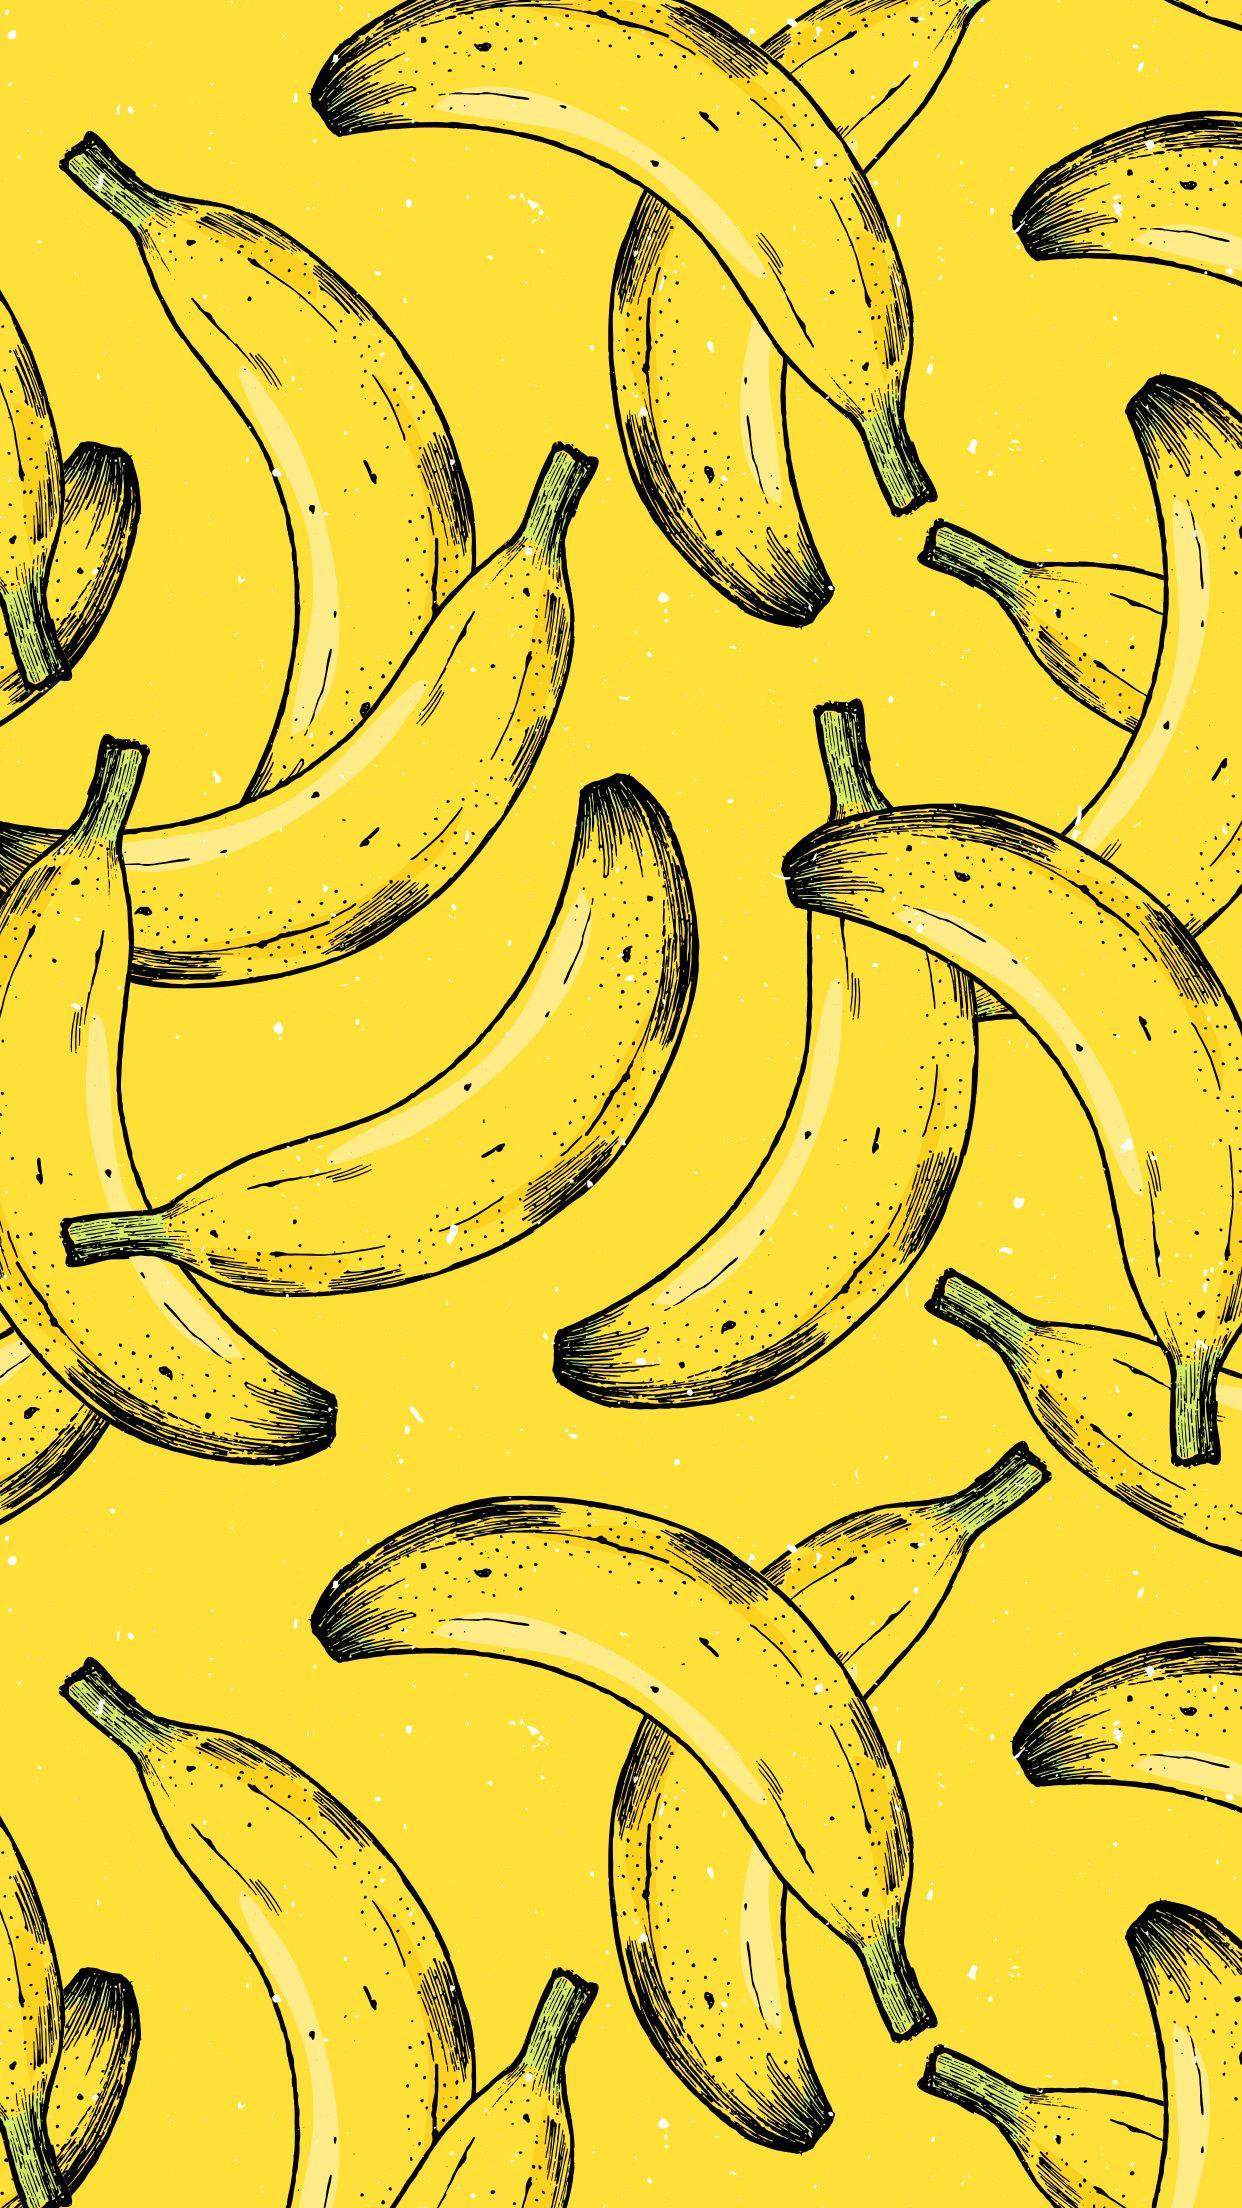 Banana Iphone Wallpaper Banana Wallpaper Yellow Wallpaper Iphone Background Wallpaper